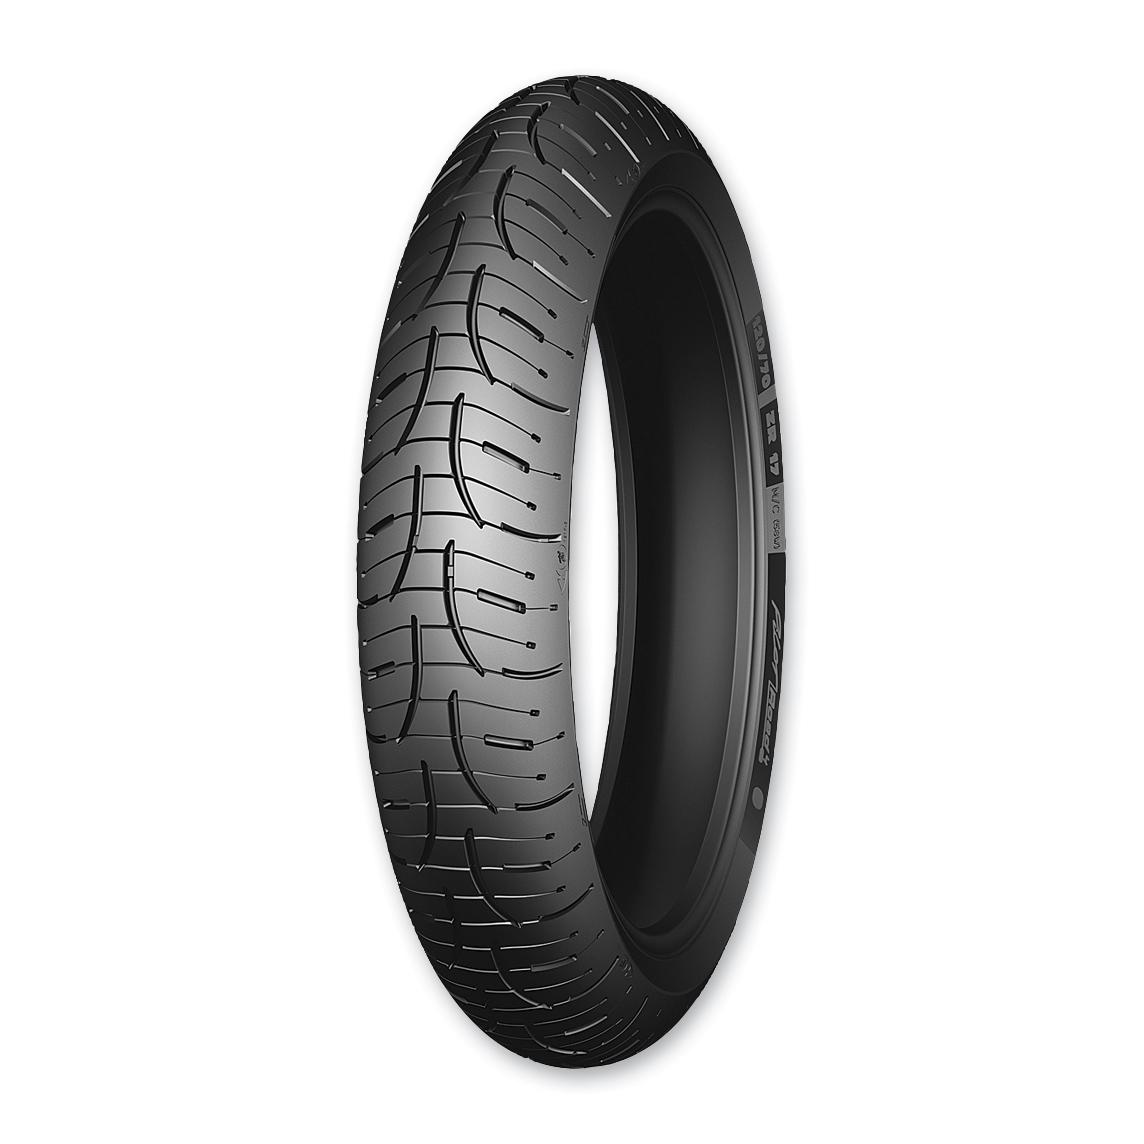 Michelin Pilot Road 4 GT 120/70ZR17 Front Tire